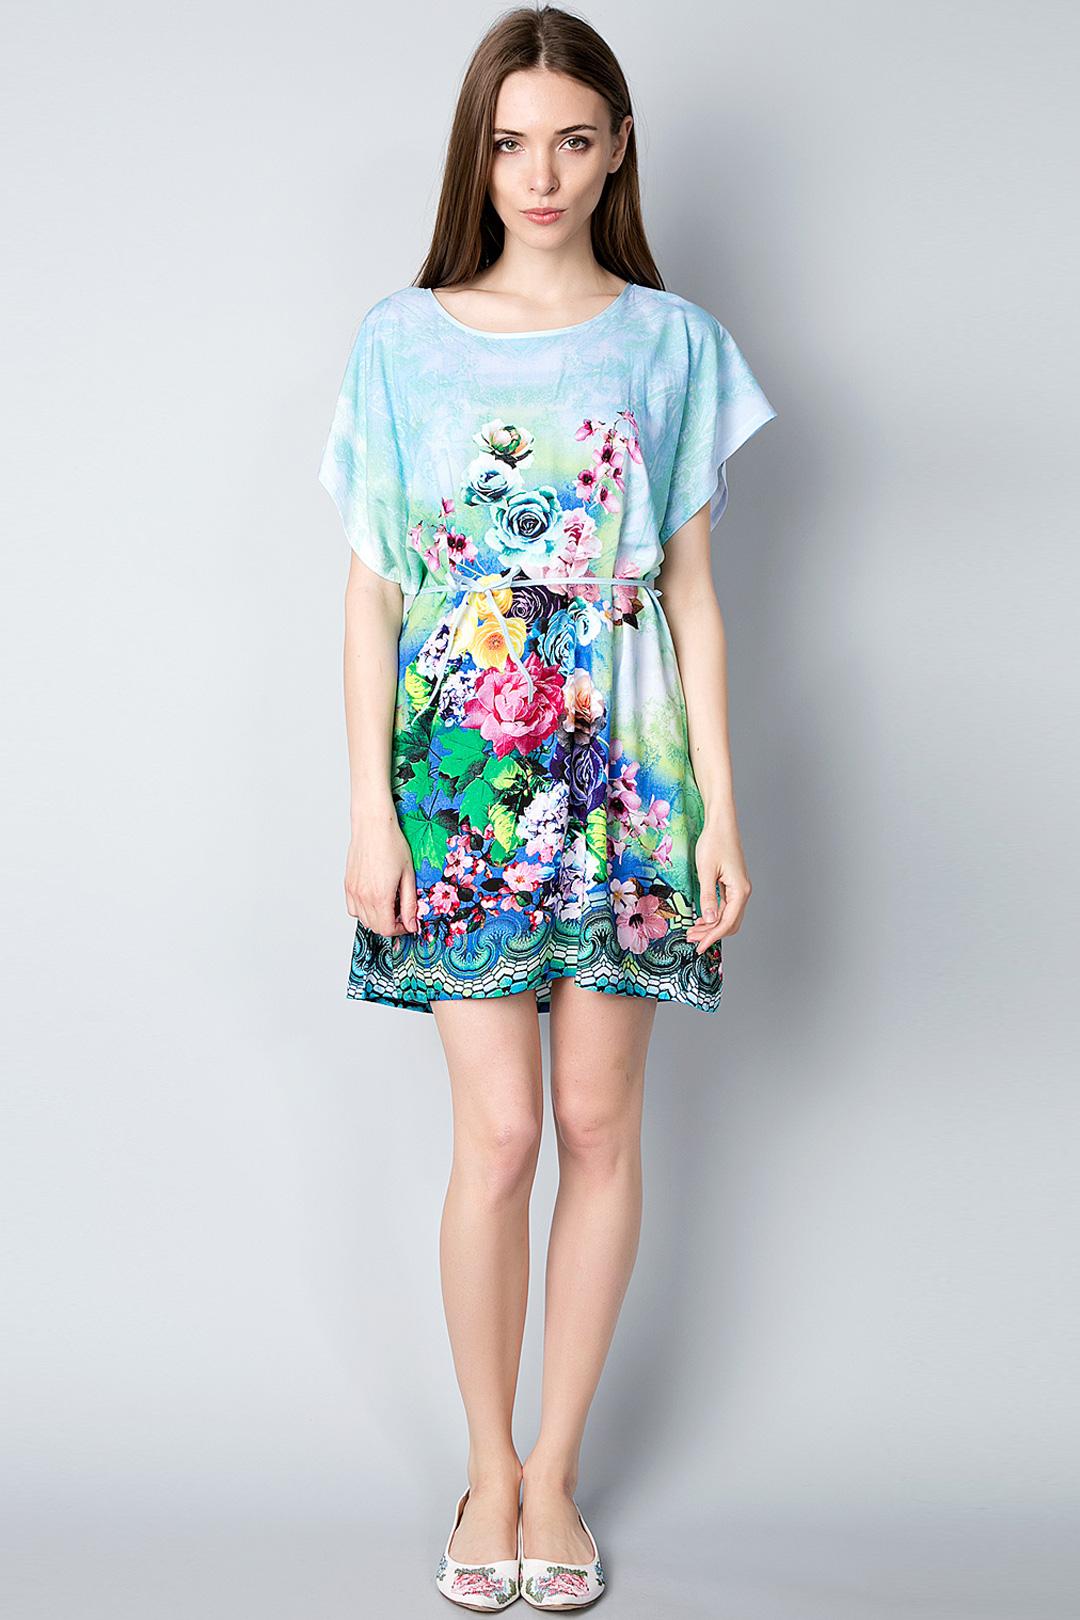 Платье туника на лето